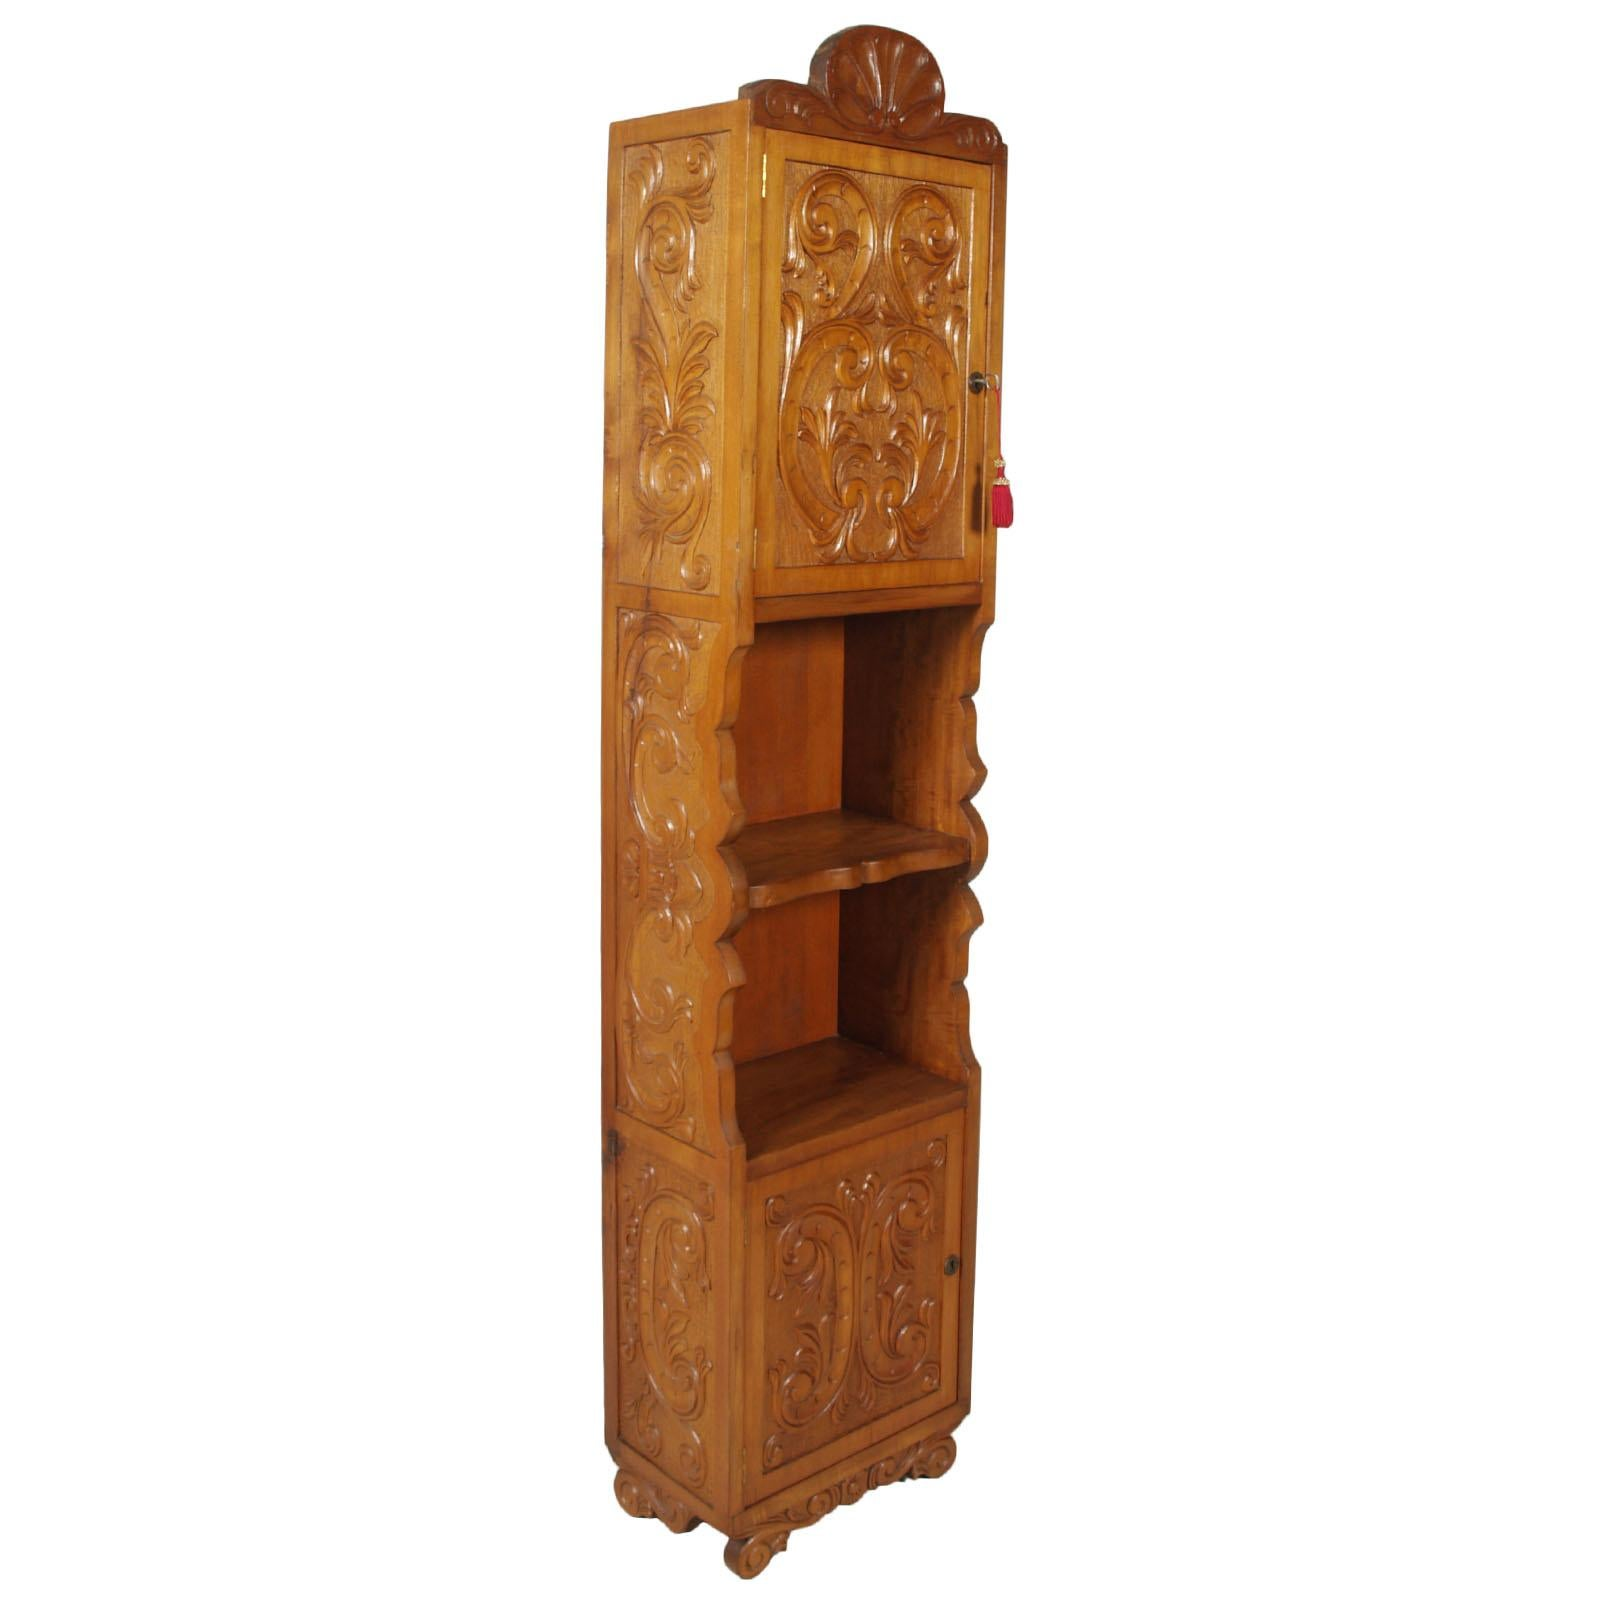 Midcentury Italian Bookcase, Column Cabinet, Hand Carved Walnut Wax-Polished